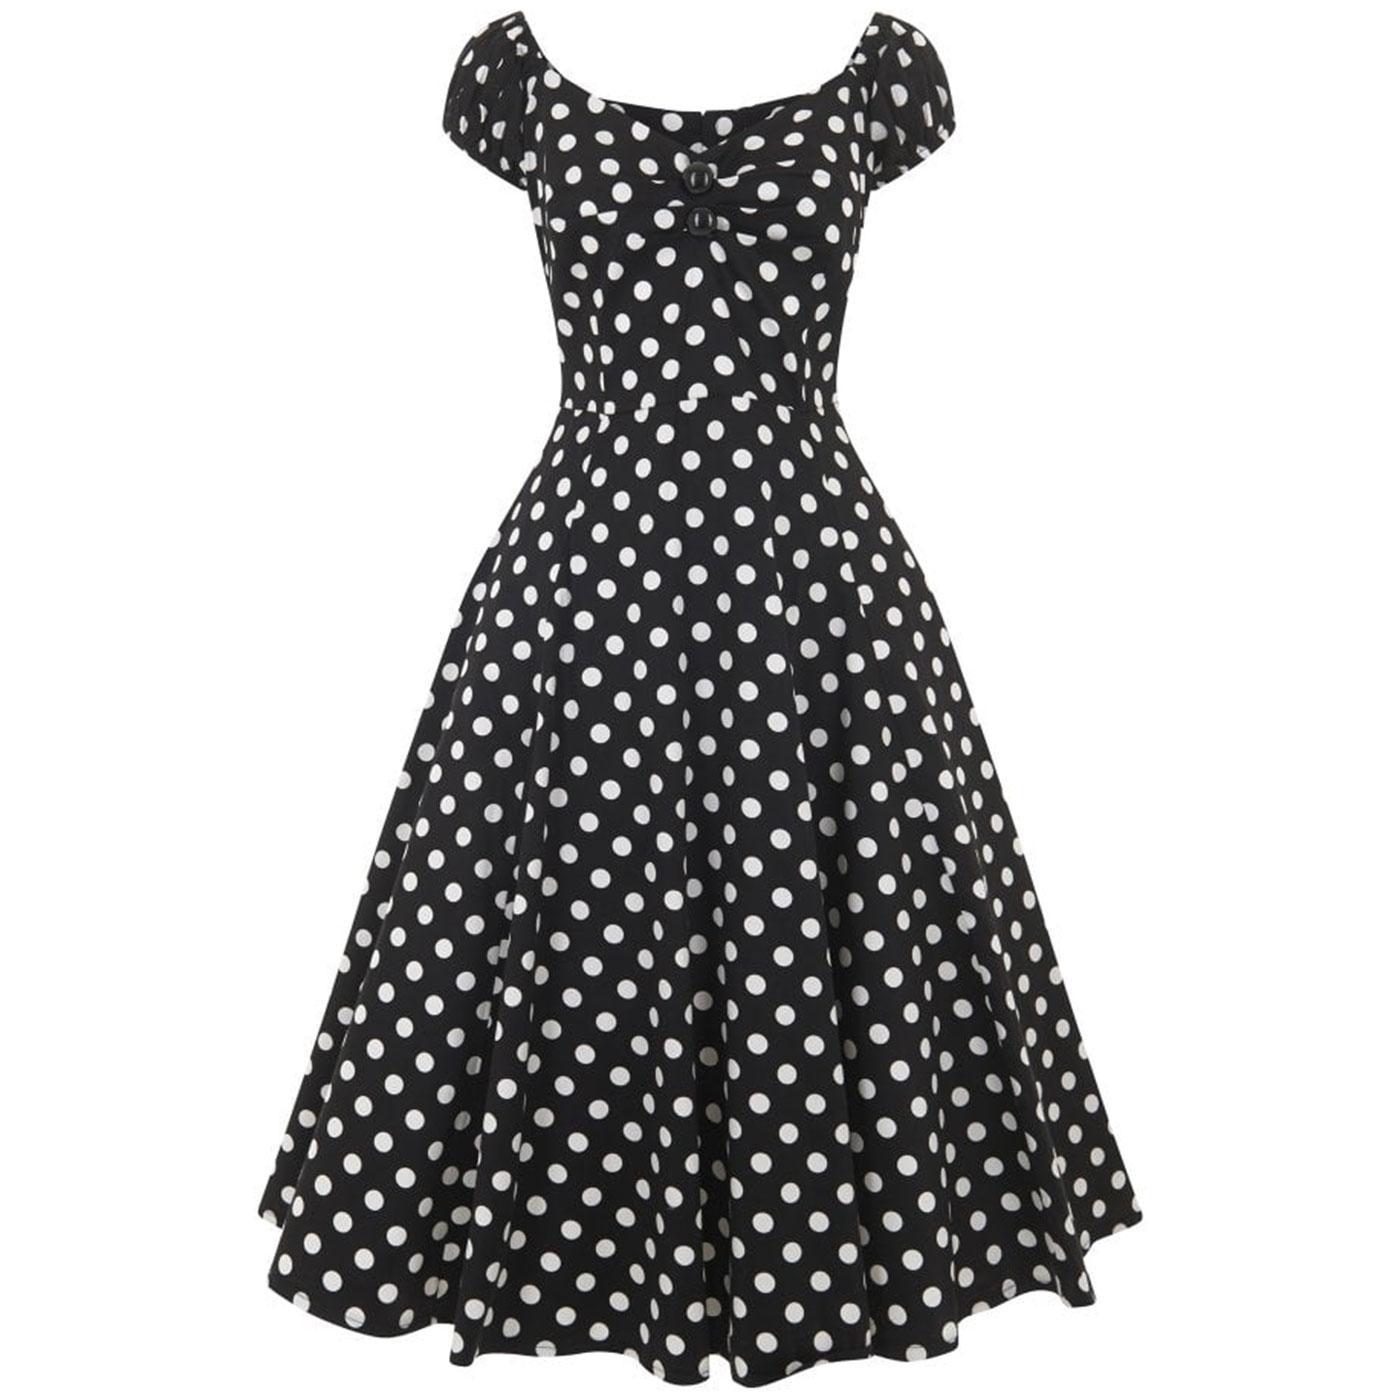 Dolores COLLECTIF 1950s Black Polka Dot Doll Dress